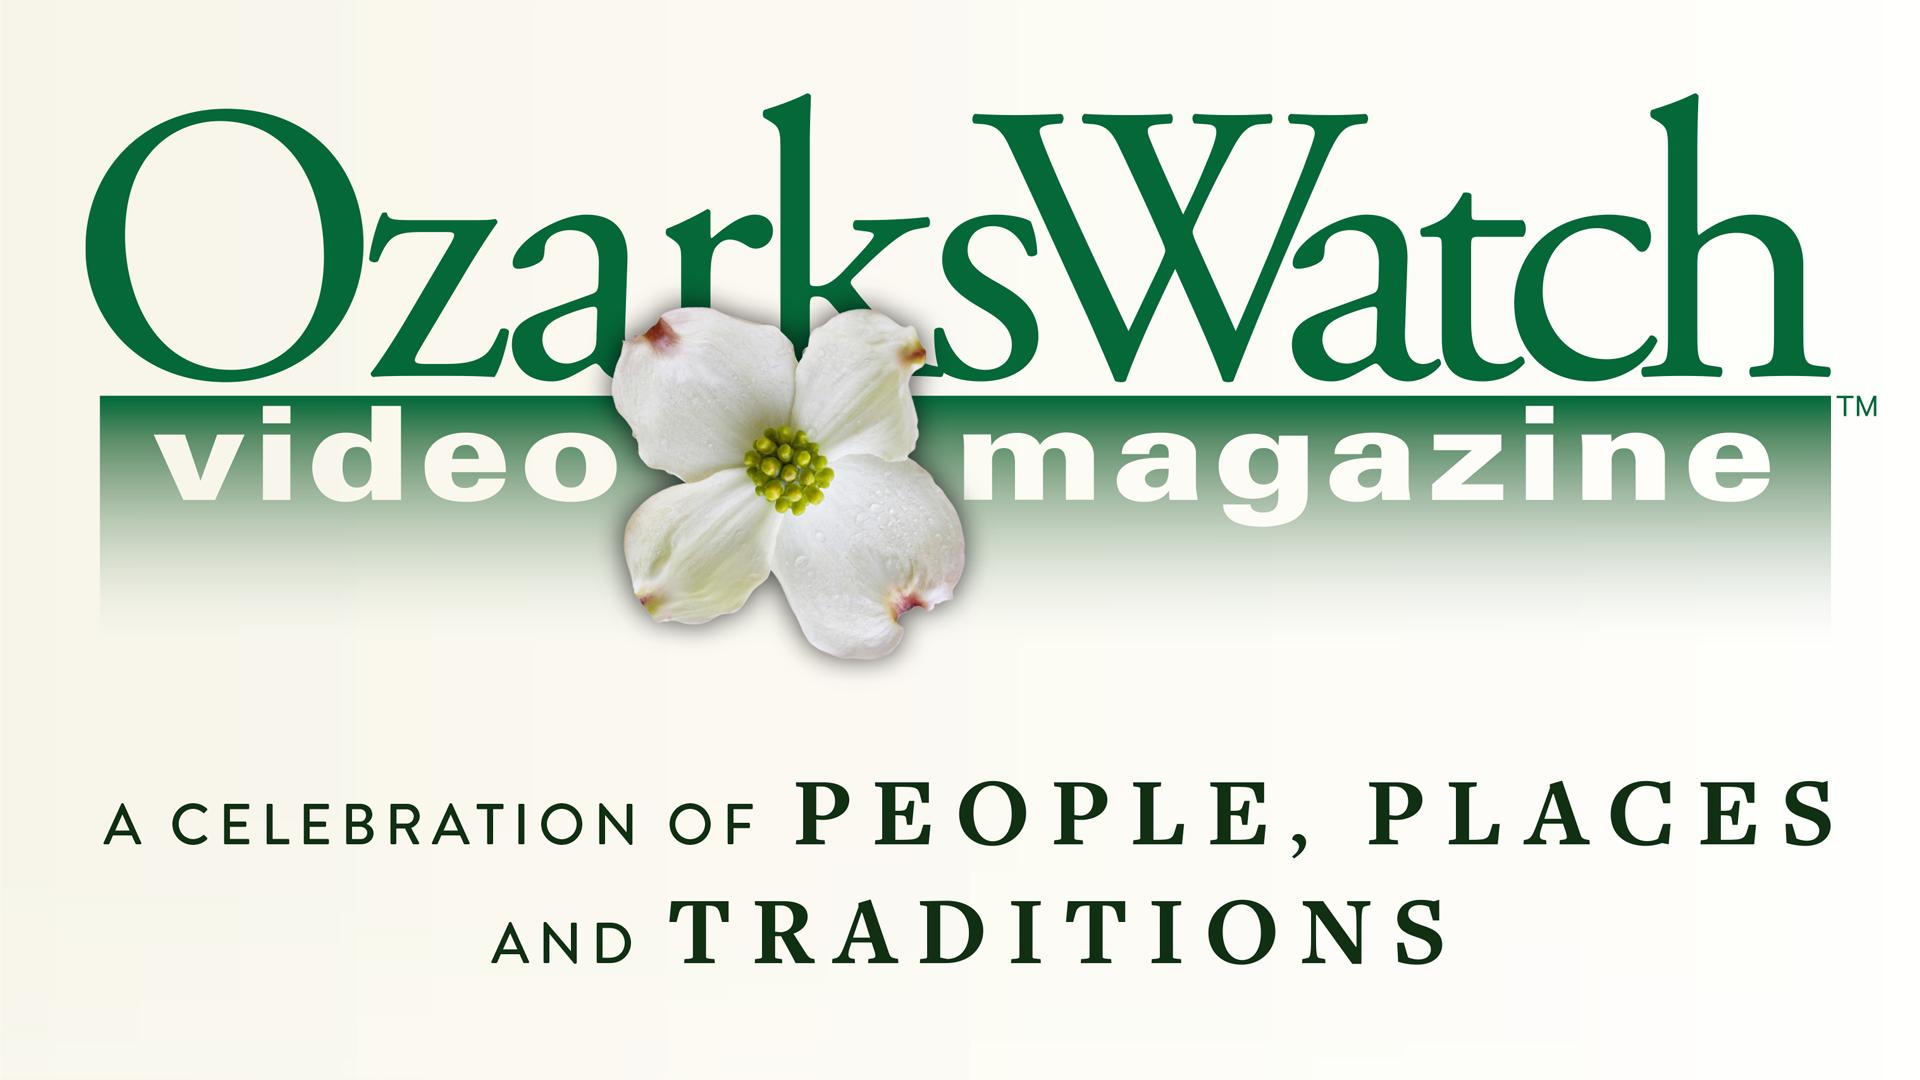 OzarksWatch Video Magazine-A Celebration of People, Places